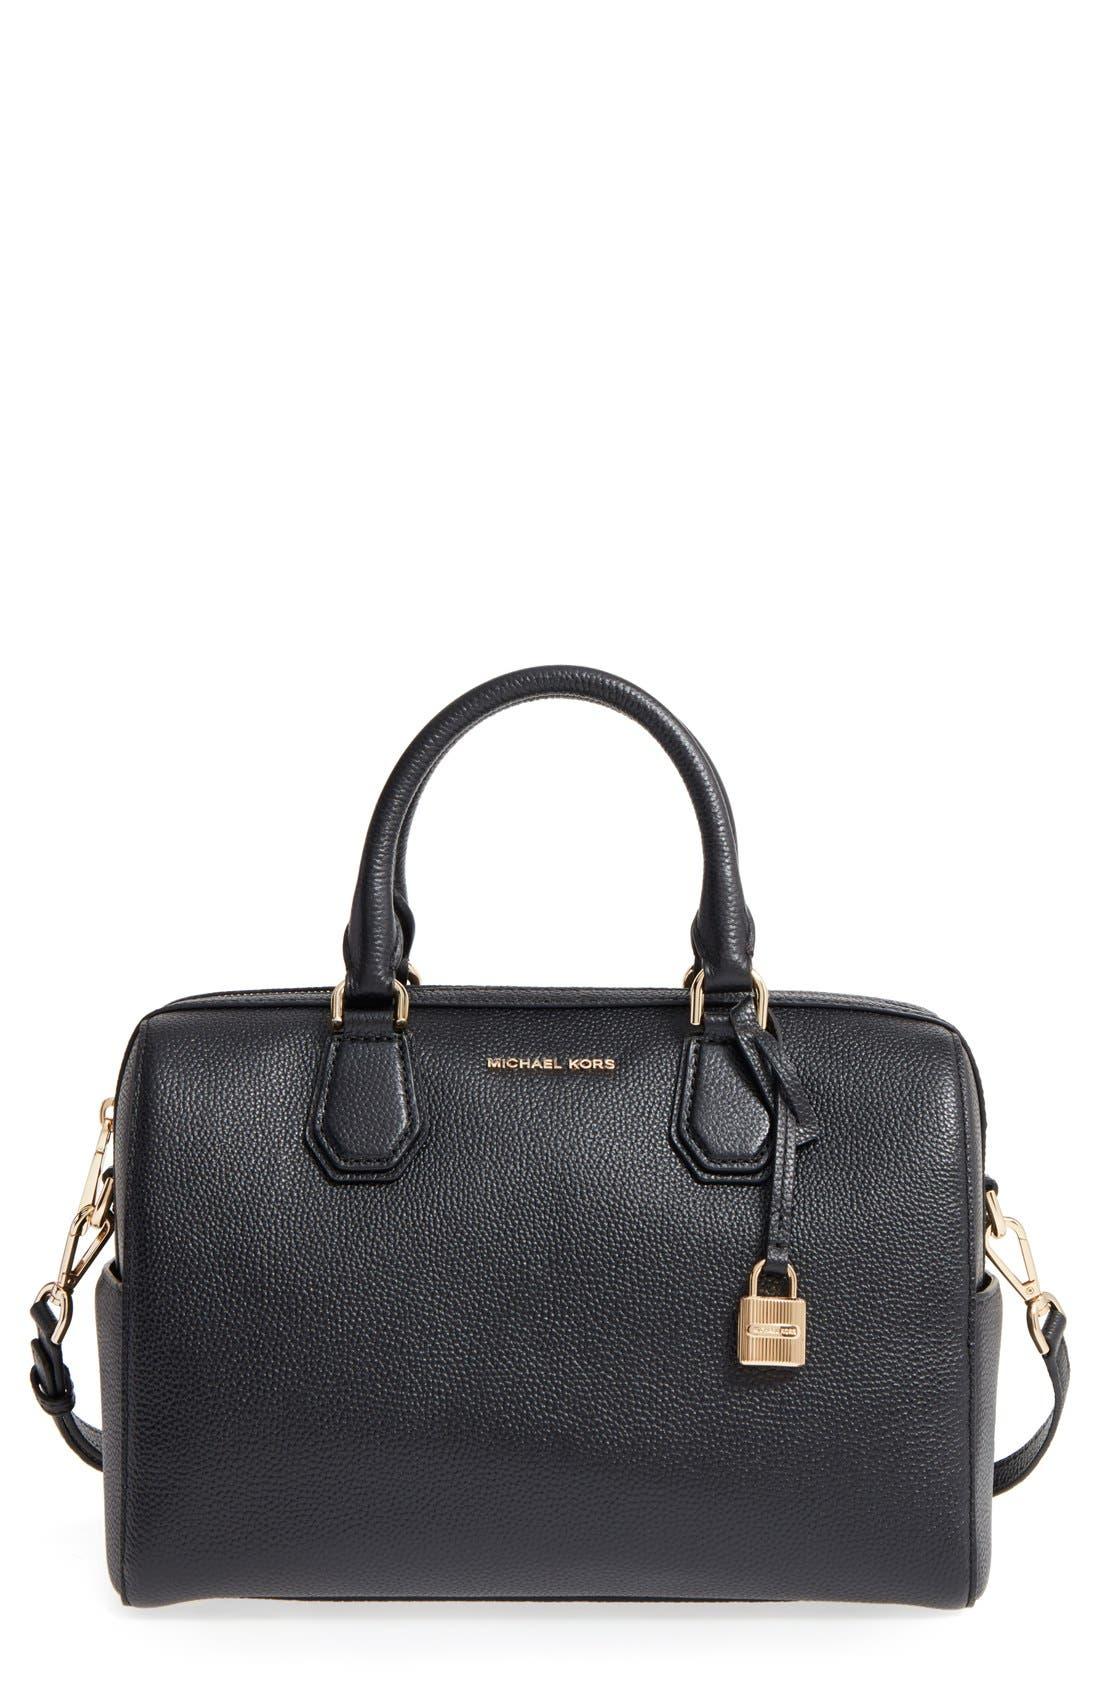 Medium Mercer Duffel Bag,                             Main thumbnail 1, color,                             Black/ Gold